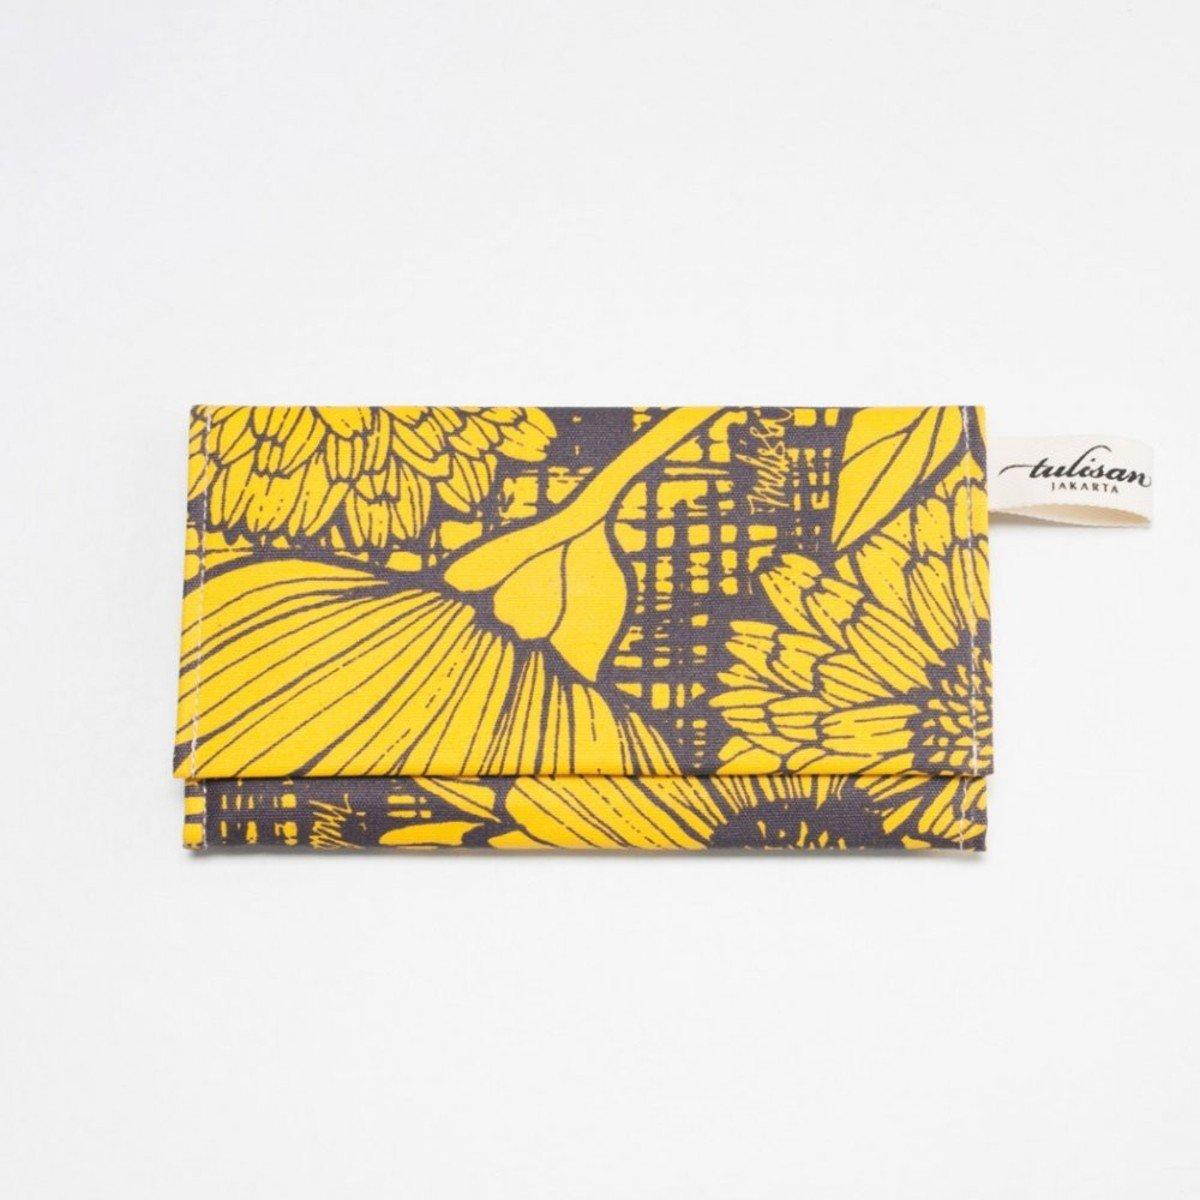 Olio Clutch 錢包 - Yellow Canary